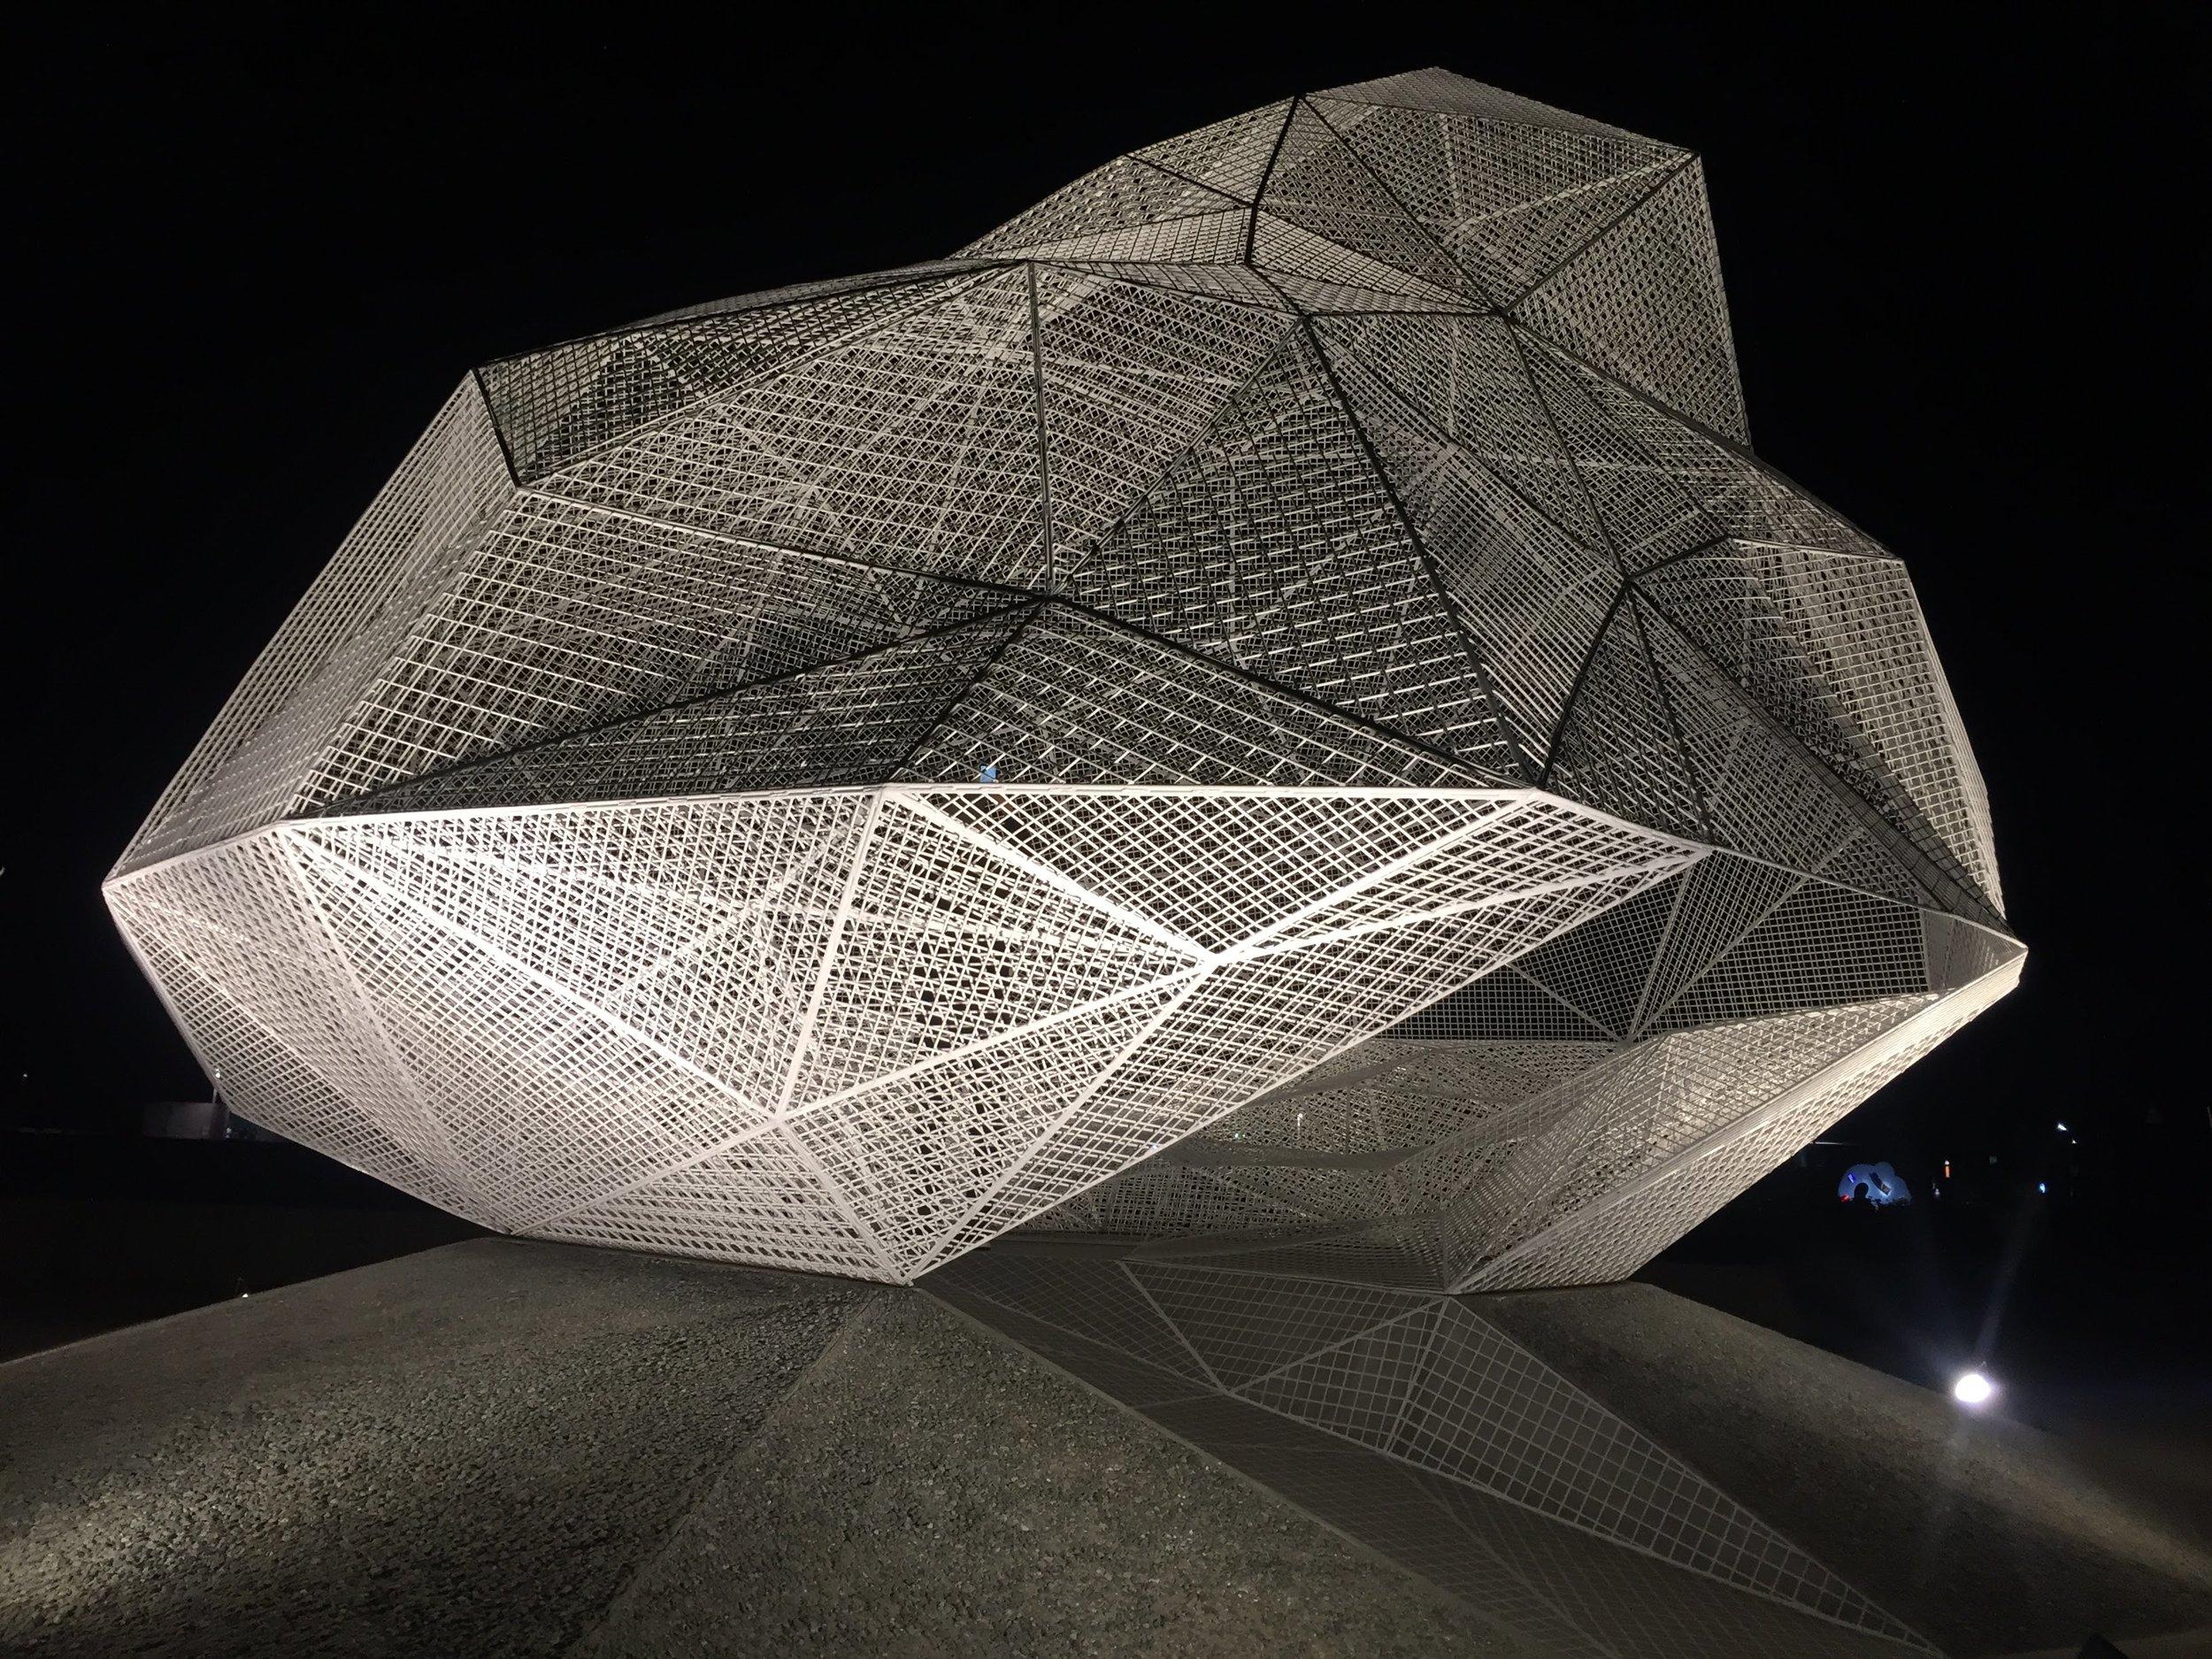 The Naoshima Pavilion